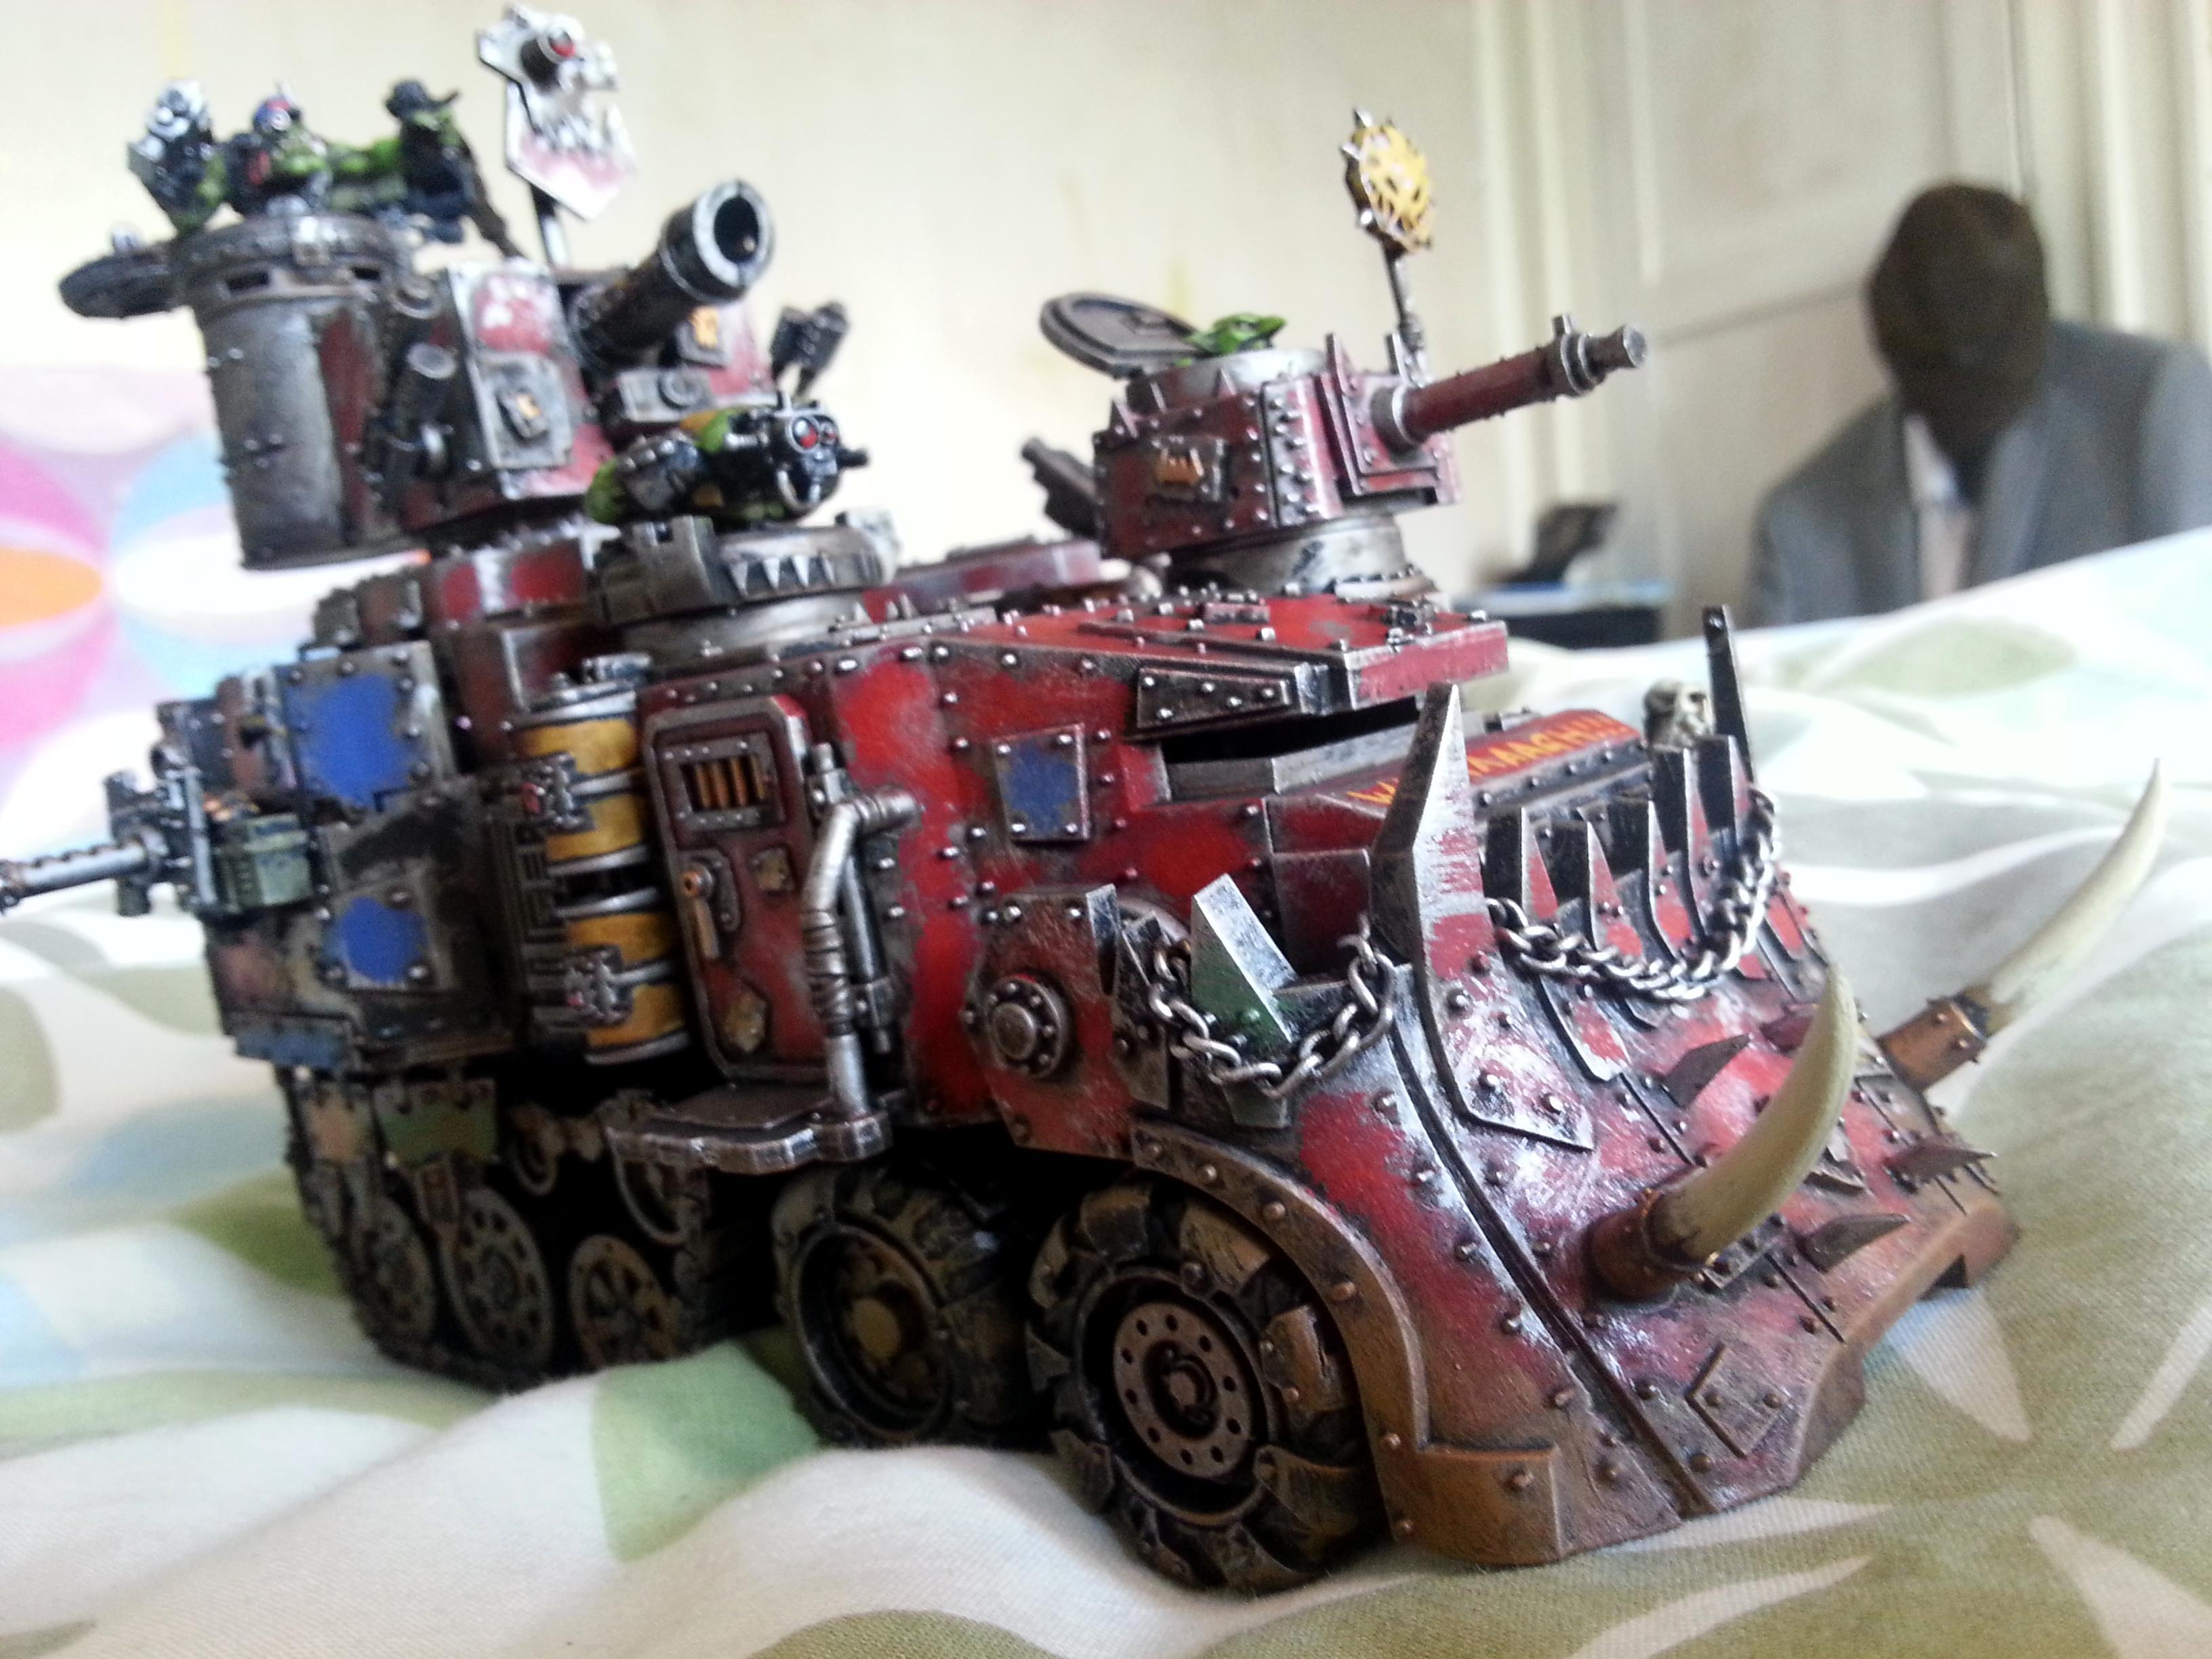 Battlewagon, Conversion, Dreadknight, Freebooter, Killa Kan, Lootaz, Old, Old Zogwort, Orks, Warbike, Warboss, Wierdboy, Zogwort